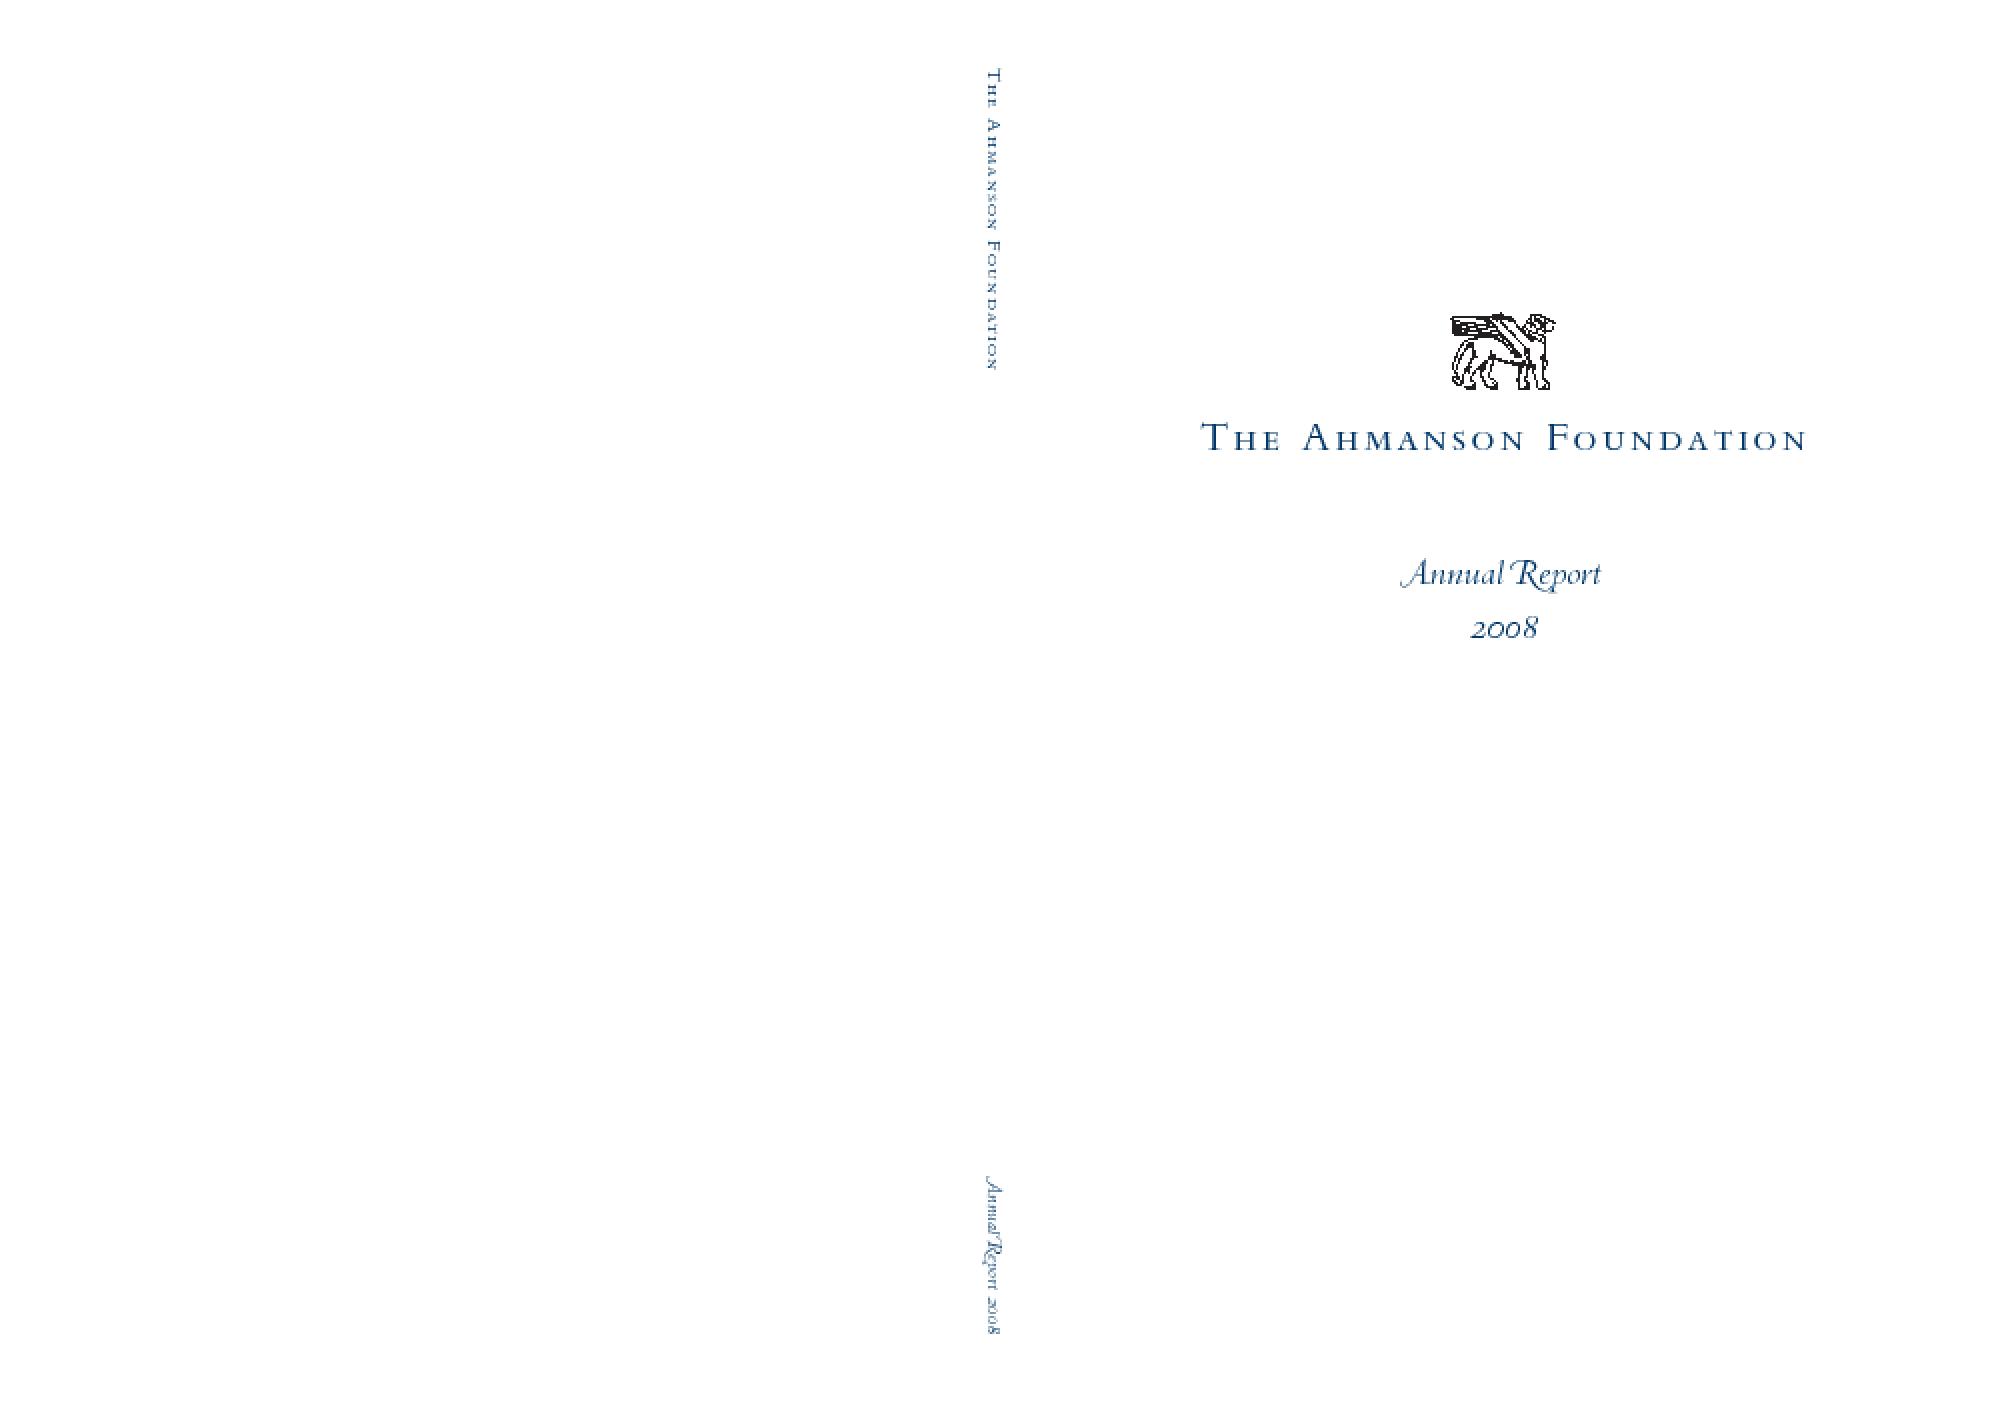 Ahmanson Foundation - 2008 Annual Report